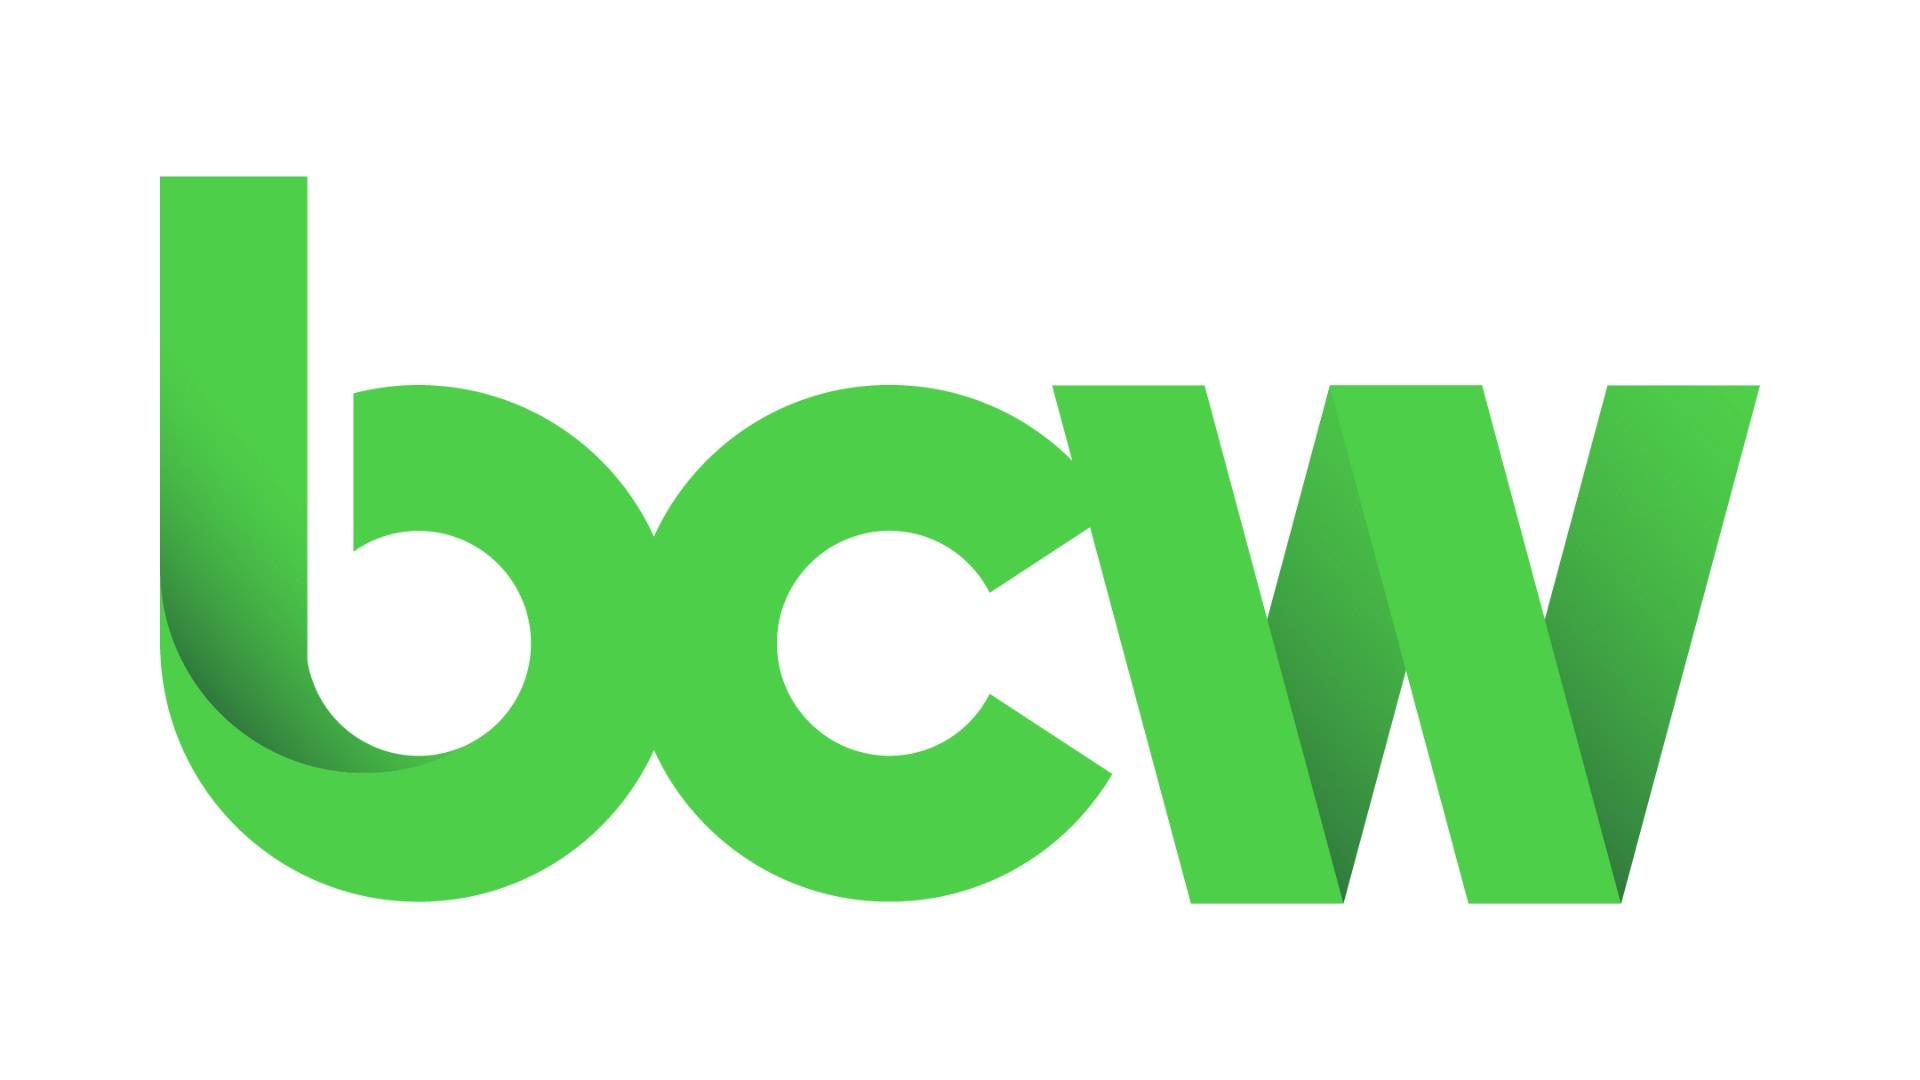 Agence BCW Burson Cohn Wolfe (1) Logo